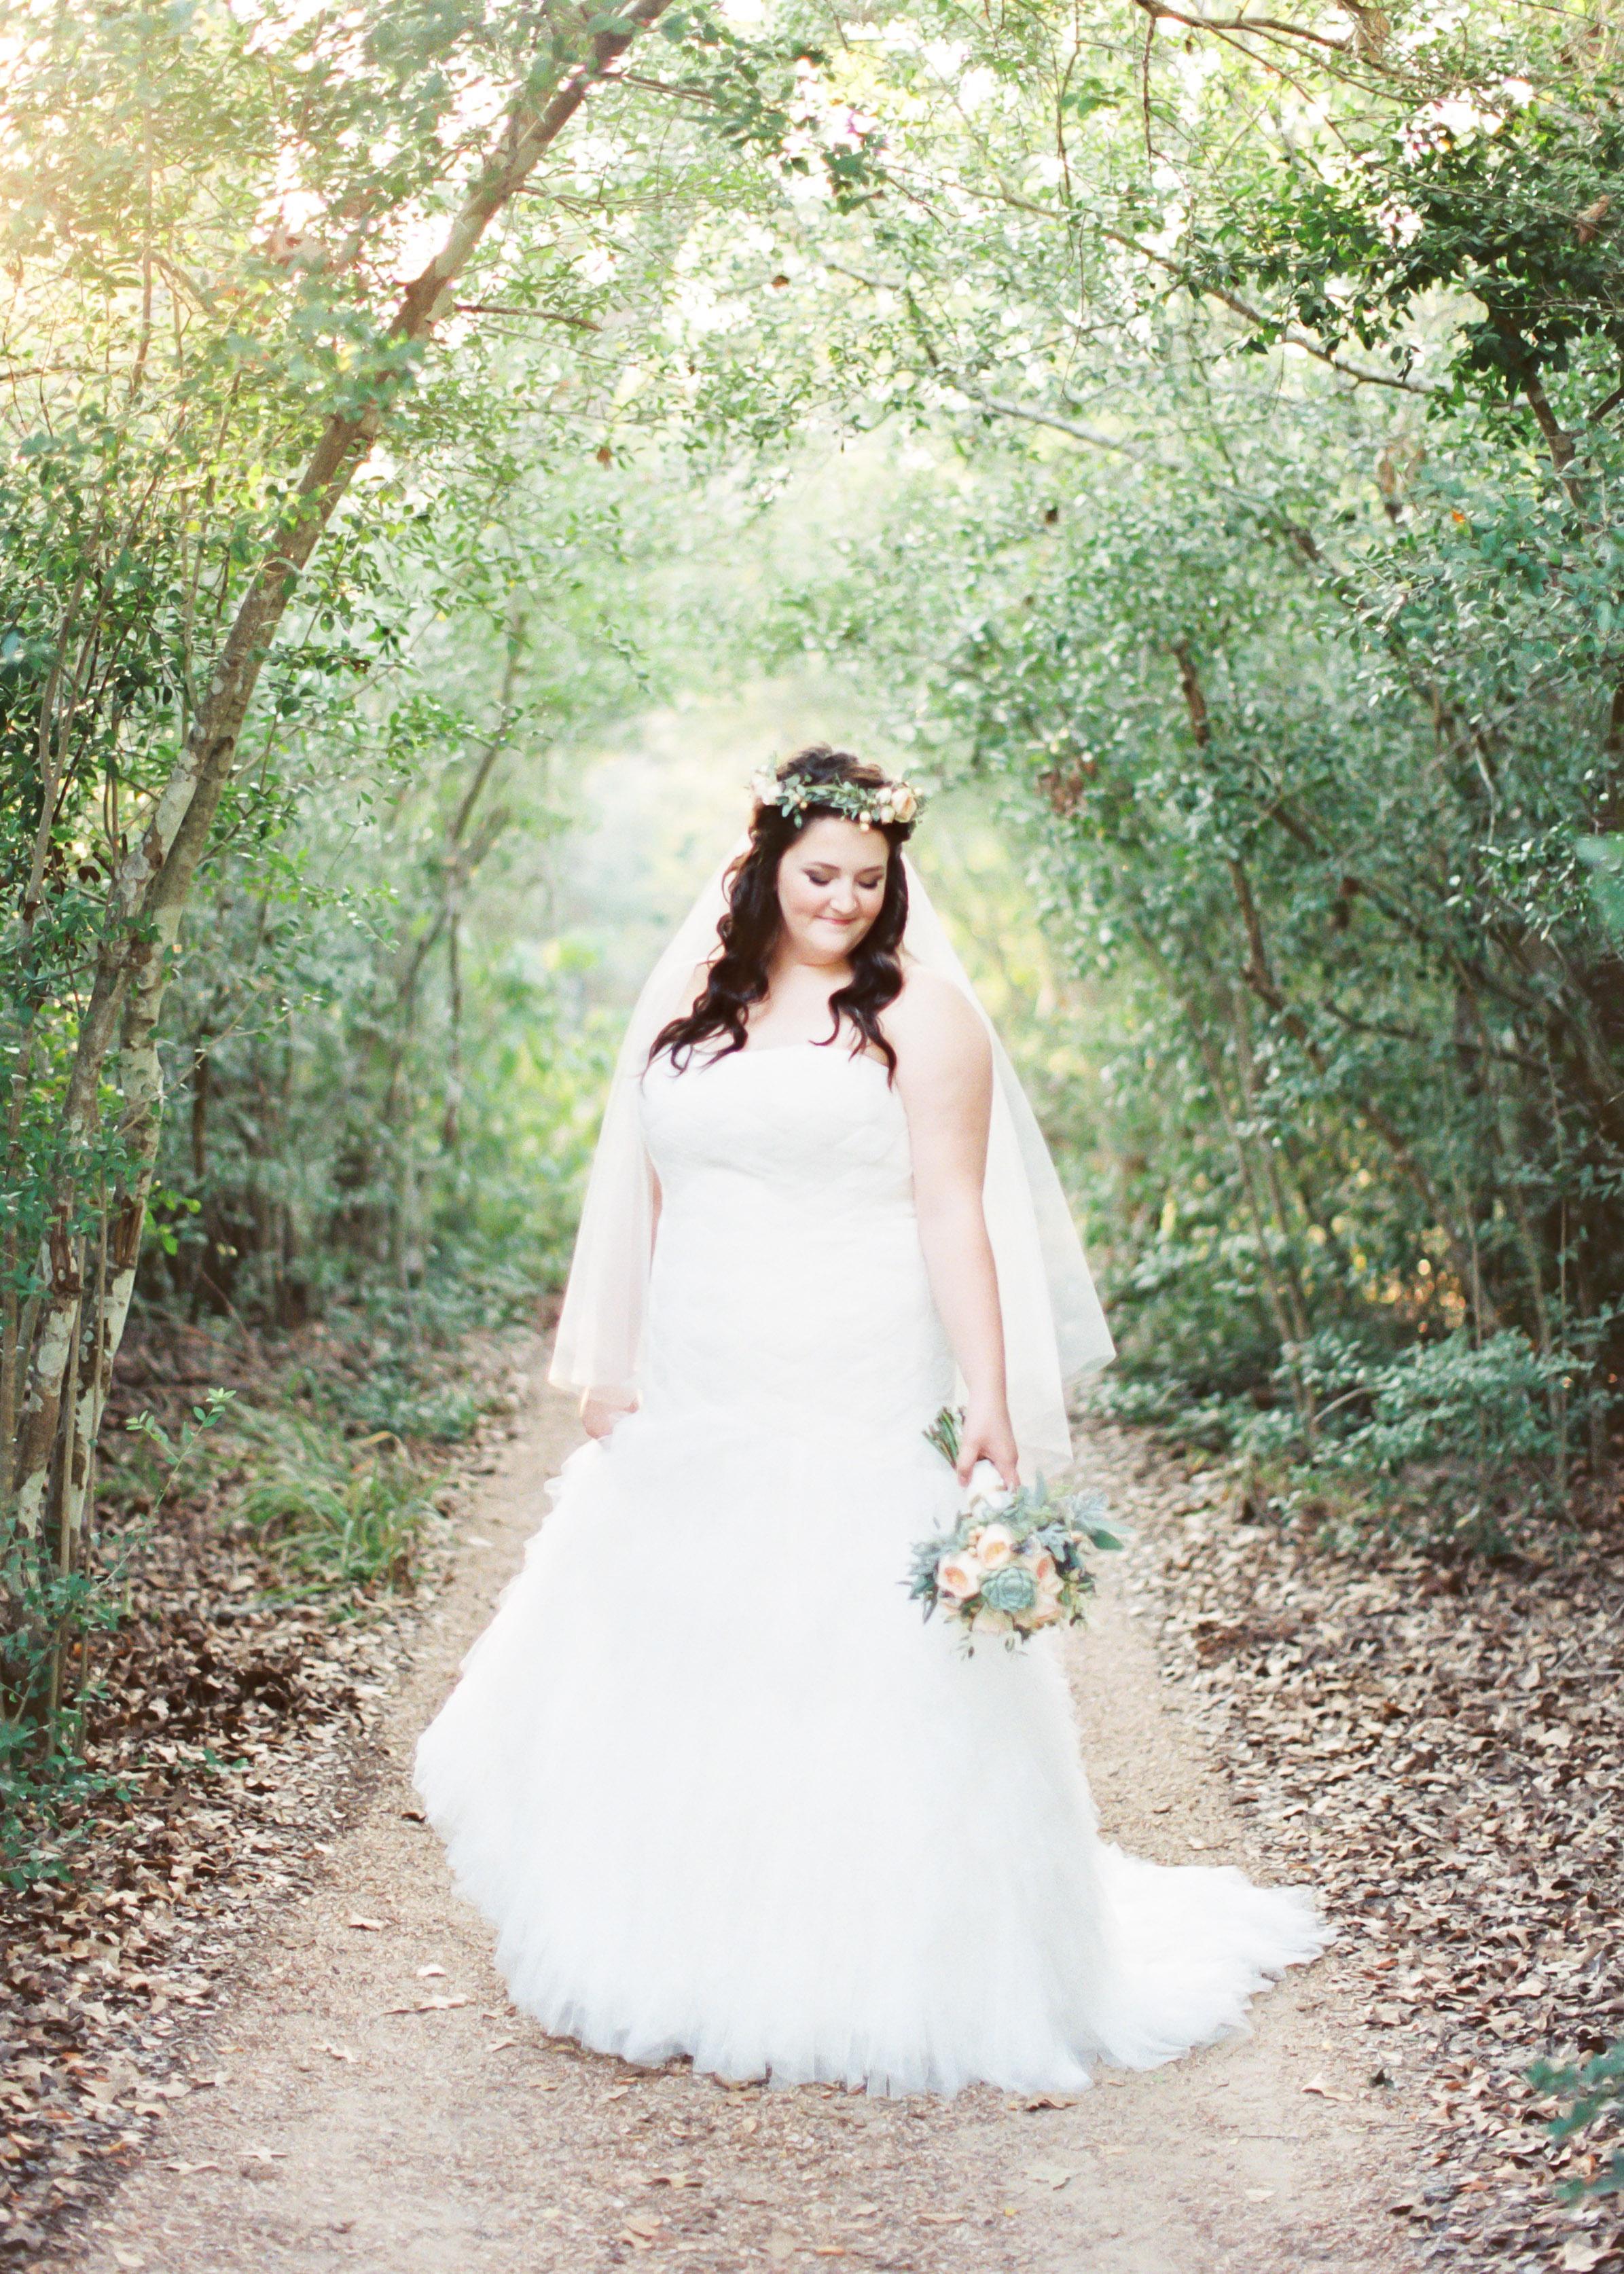 Sarah Best Photography - Elizabeth's Bridals - 7F Lodge-112.jpg